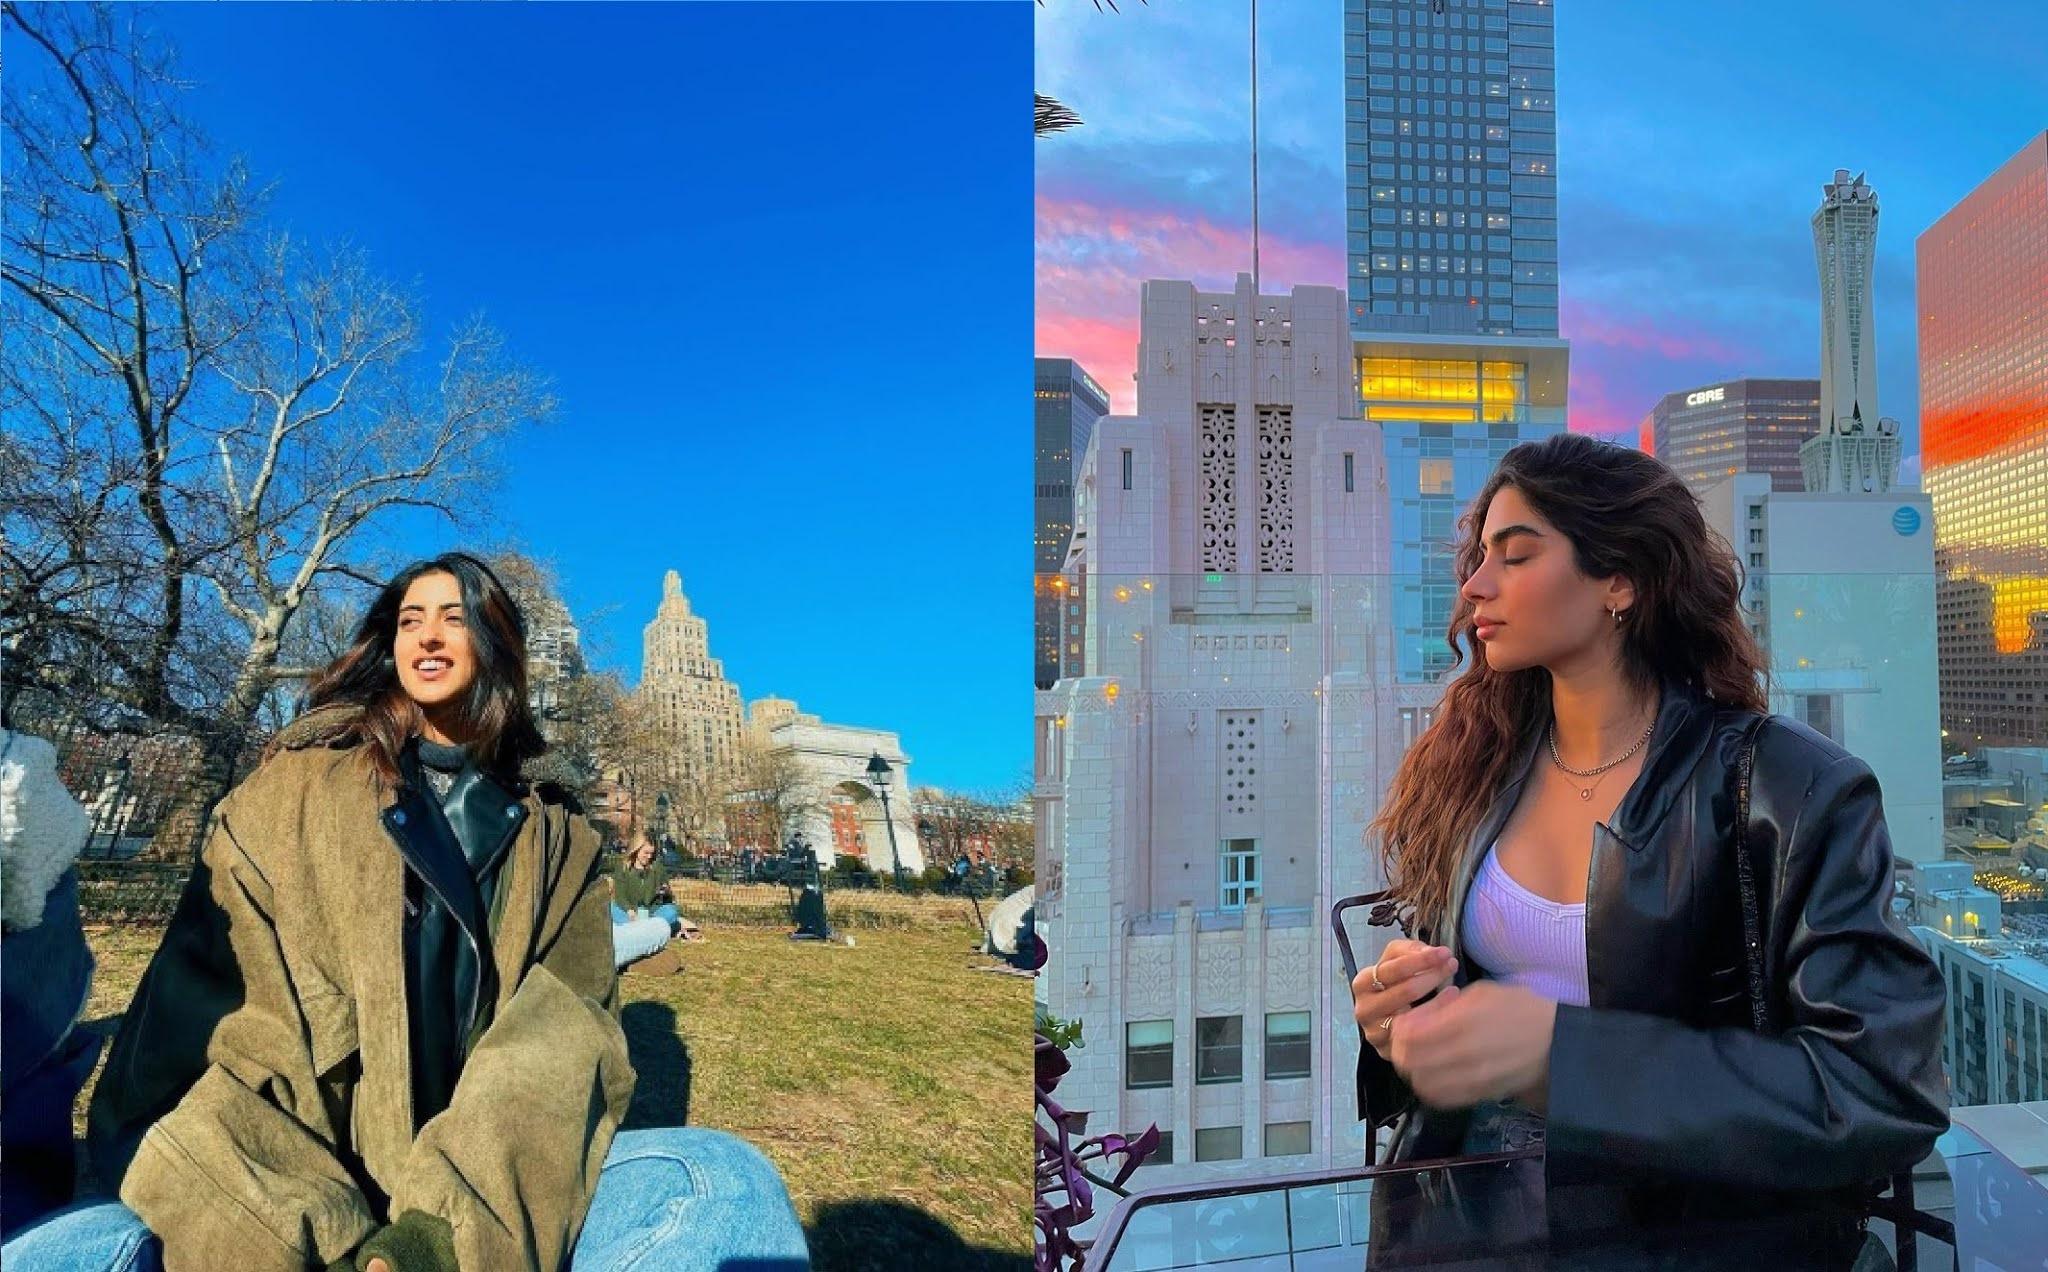 Actors Gossips: Navya Naveli Nanda and Khushi Kapoor live it up in New York, share photos